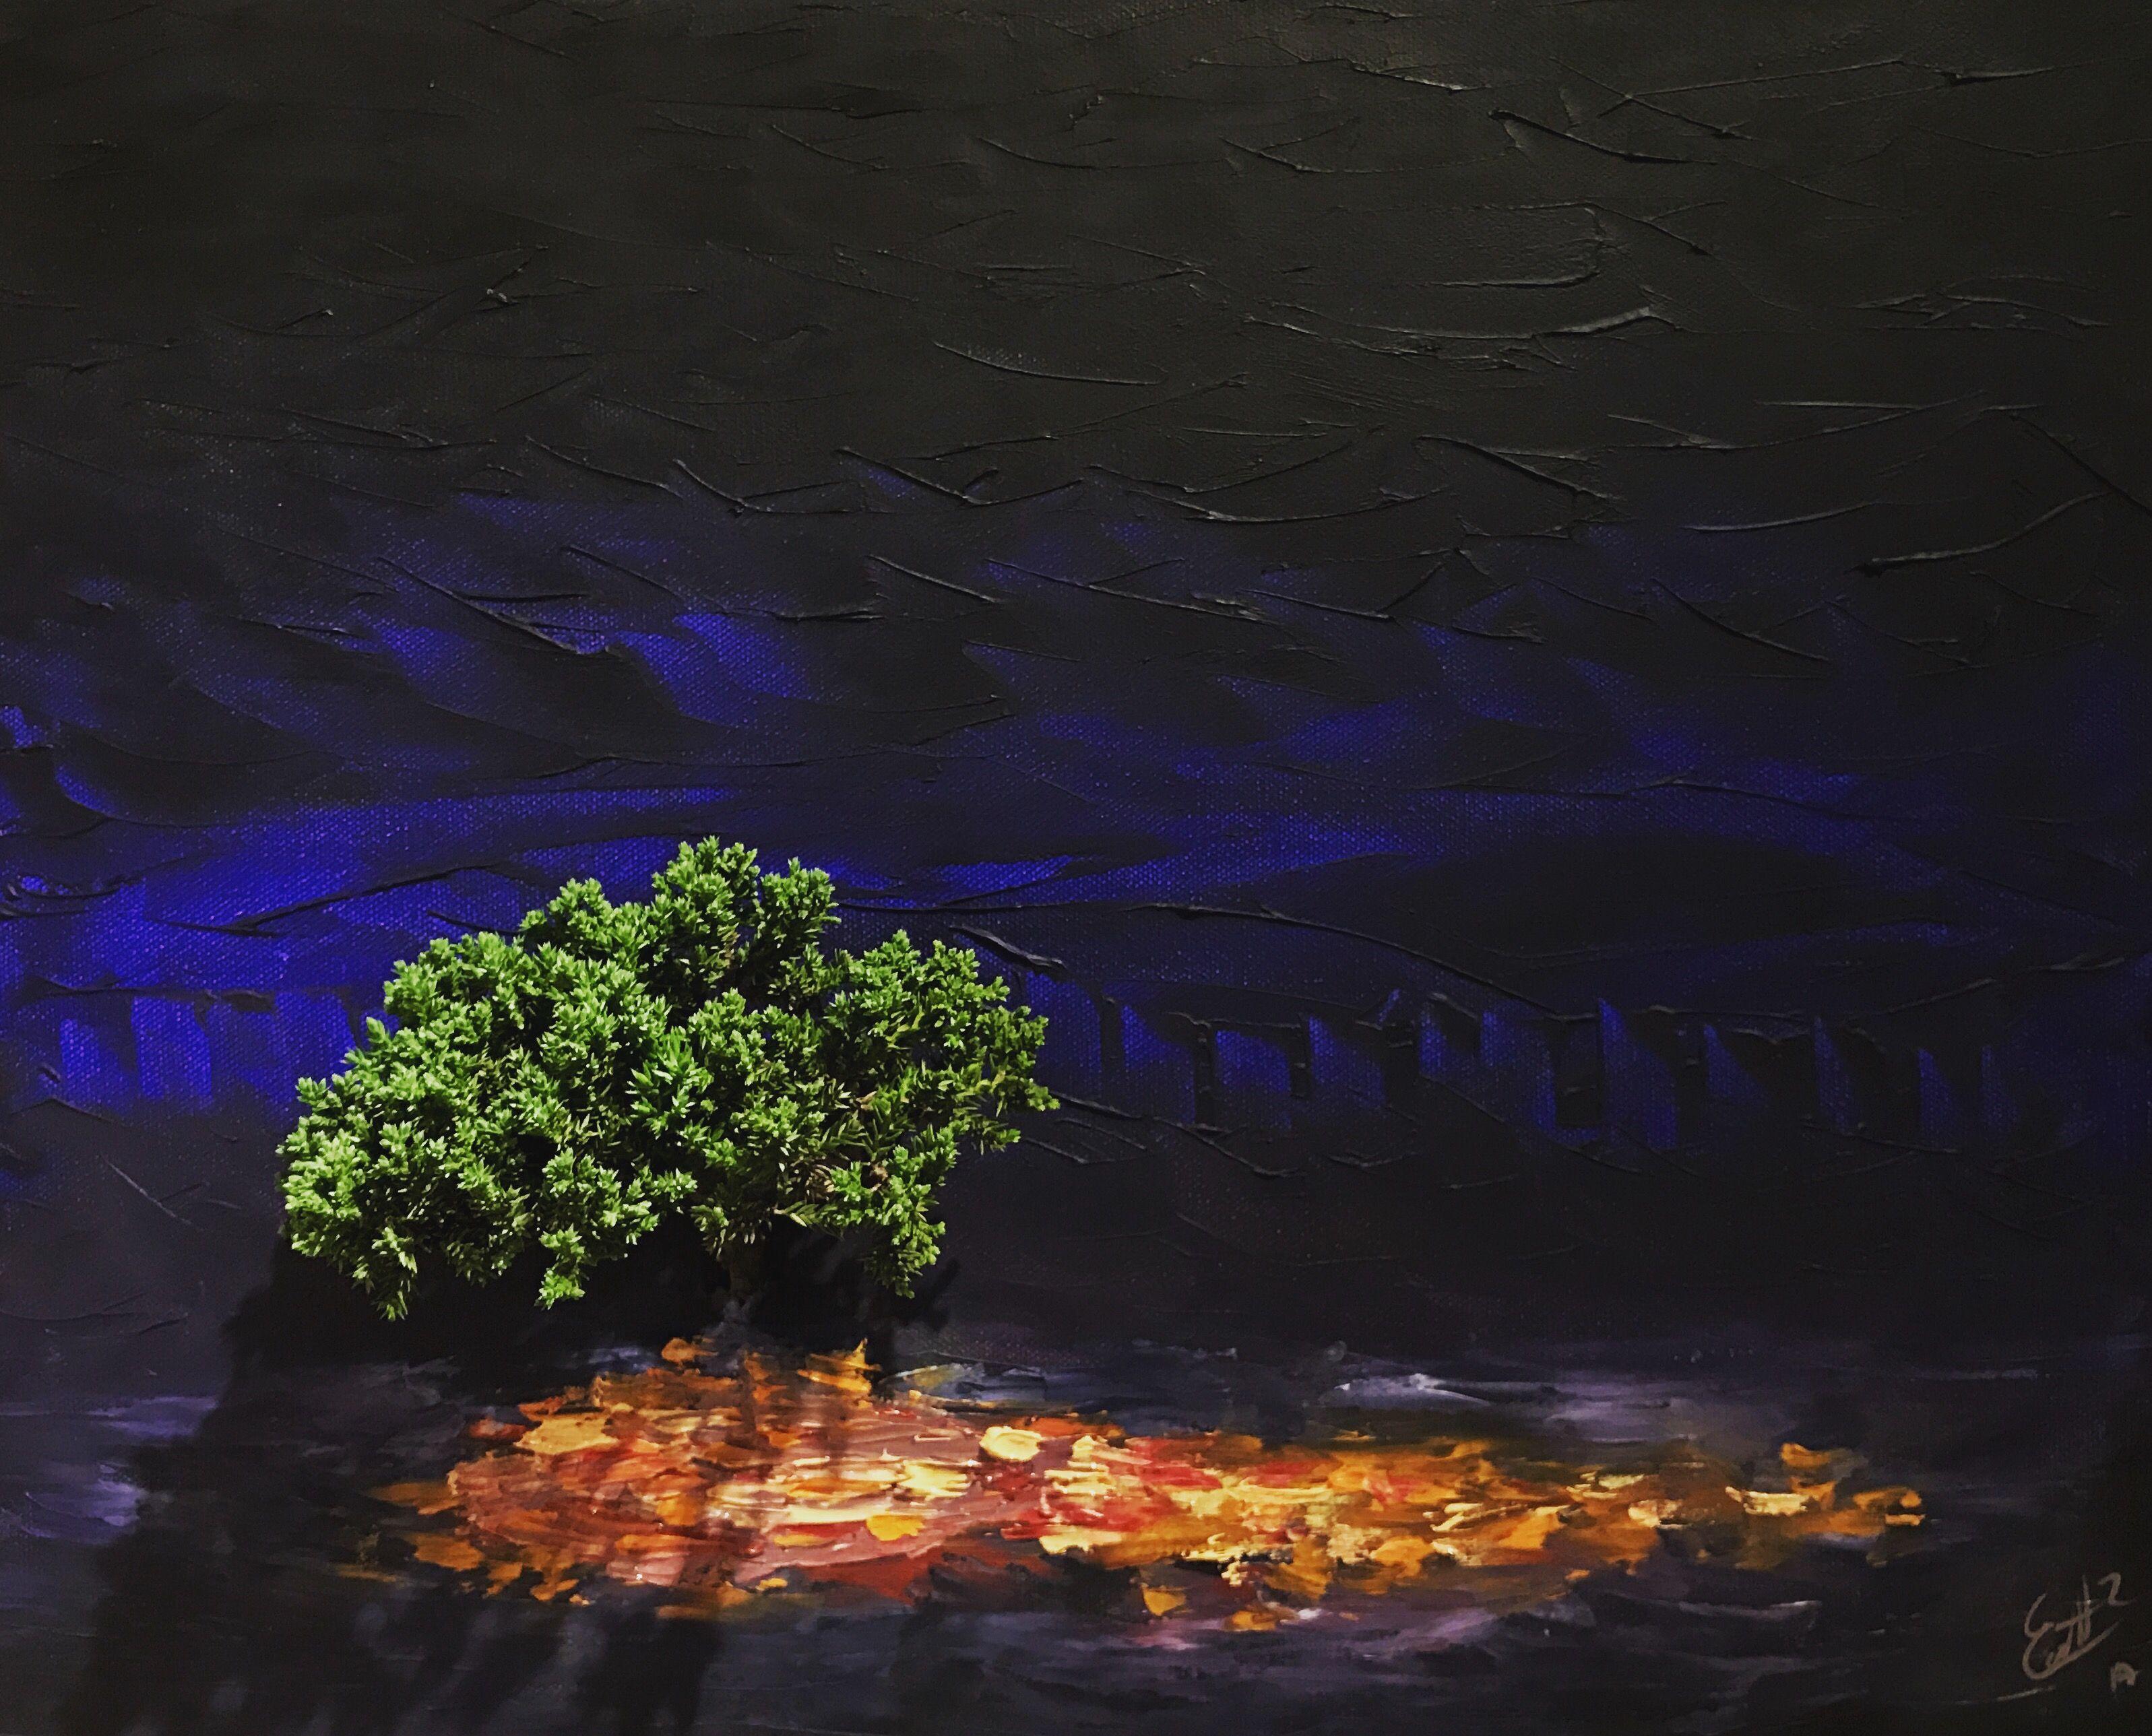 Pintura viva ultra #hyper #realism #concept #tree #paint #art #oil #abstract #mexico #painting arbor en pintura de oleo arte vivo zarza ardiente